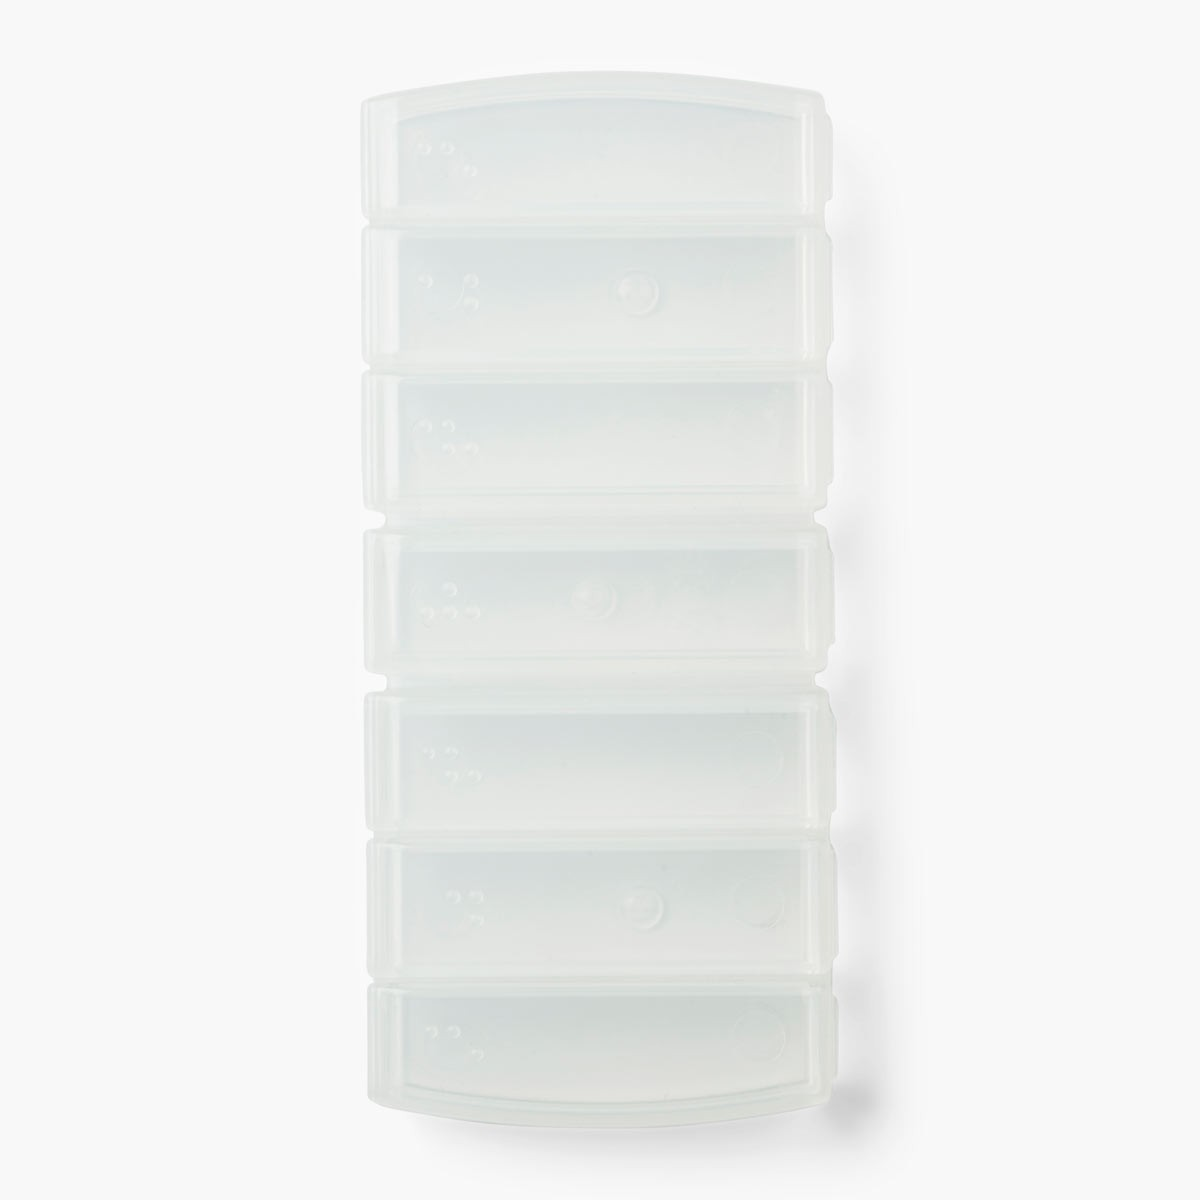 Sensemedic Pill Container